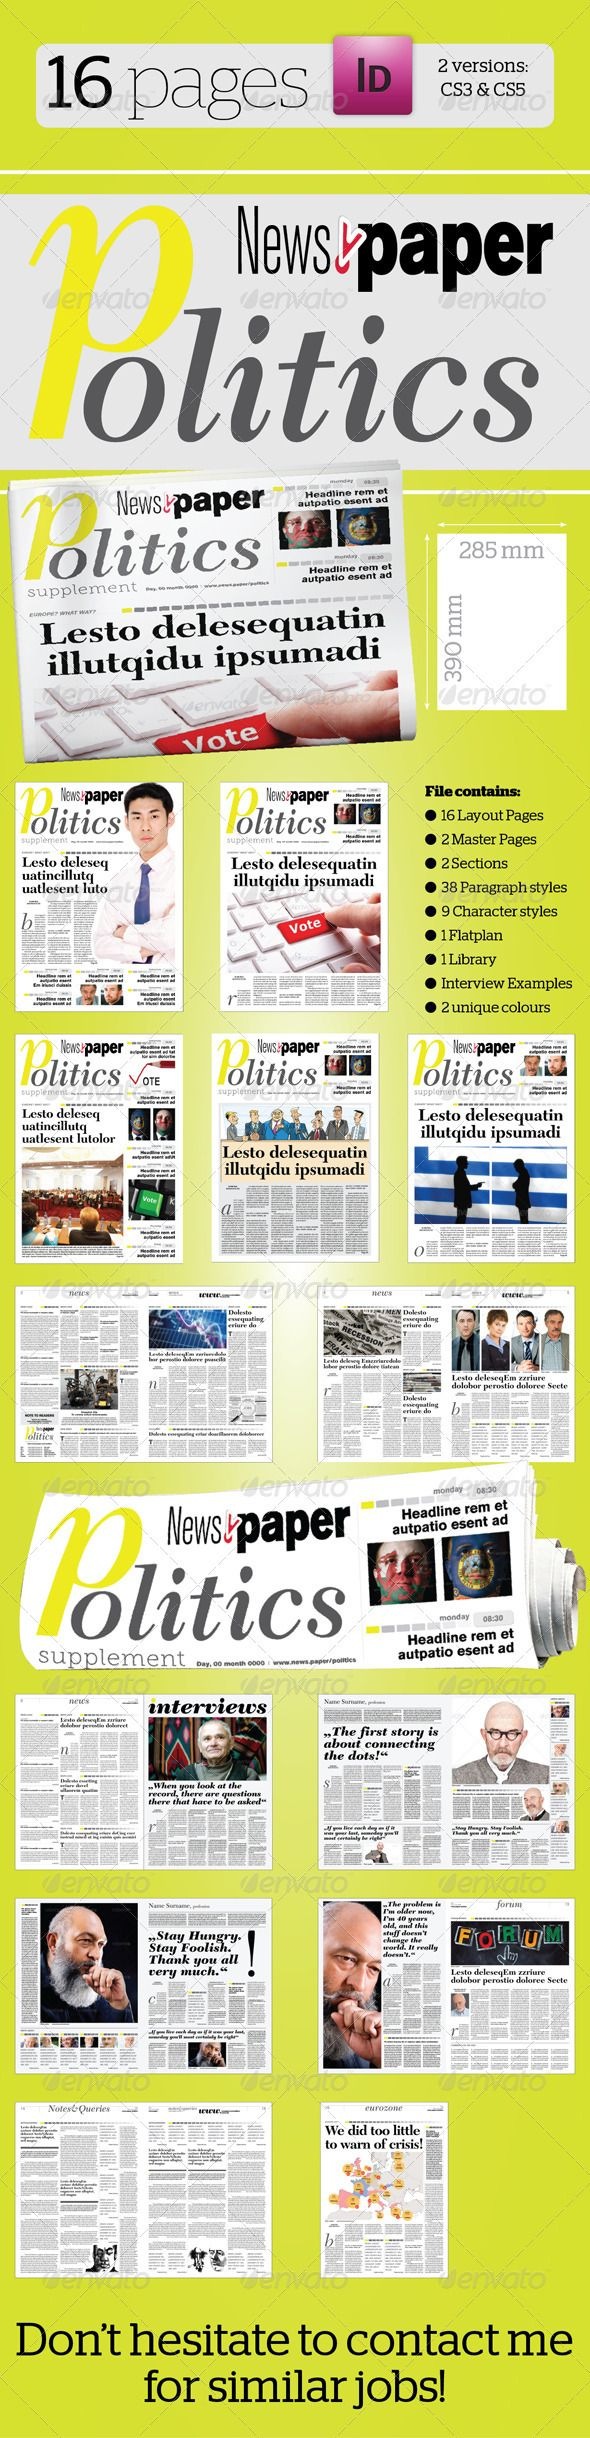 16 Pages Politics Supplement For Newsper Newsletter Templates